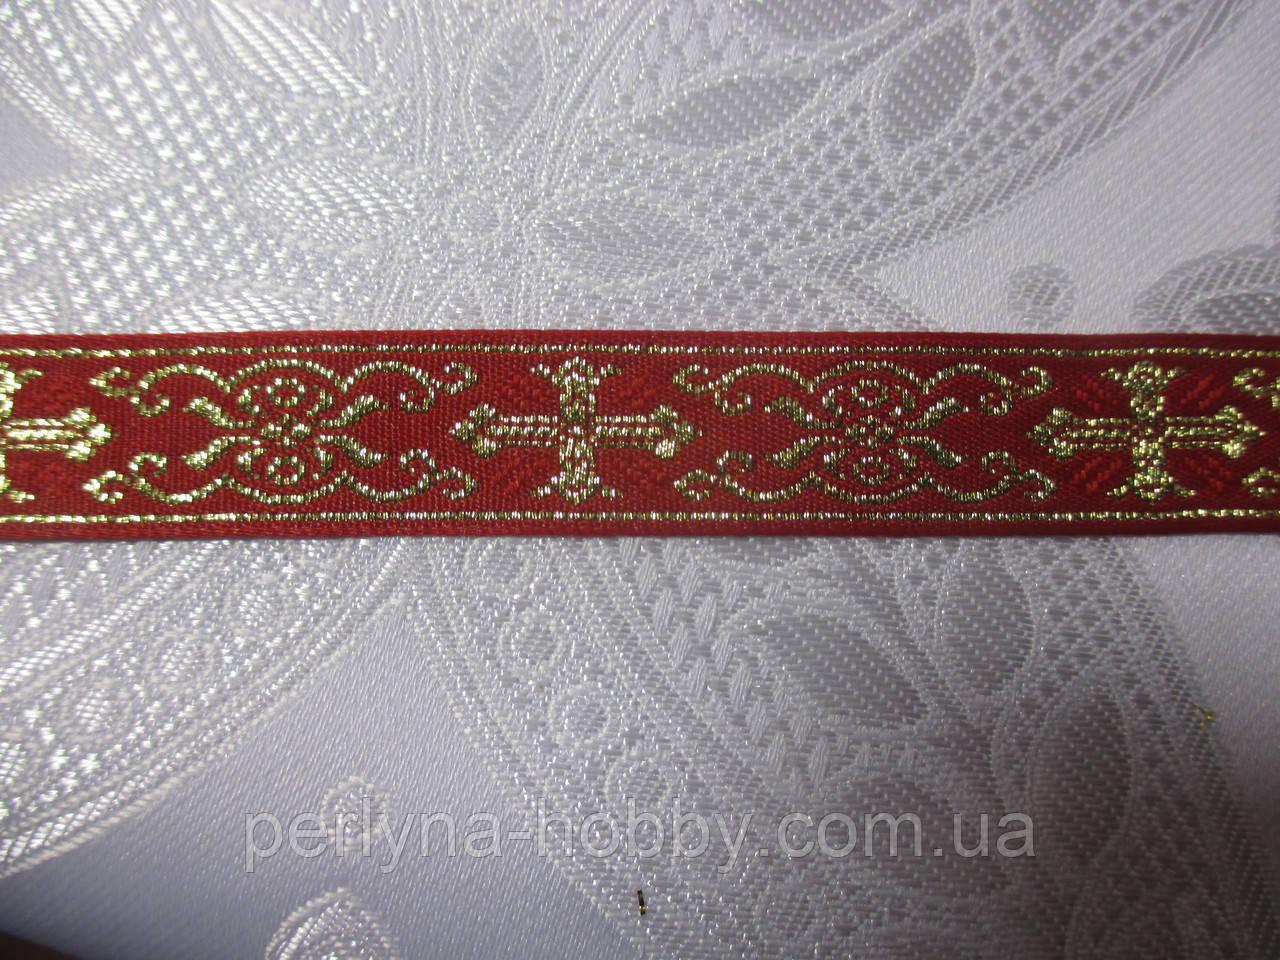 Тесьма церковная галун церковный, тесьма люрекс красная с золотом 1,5 см. Тасьма церковна червона